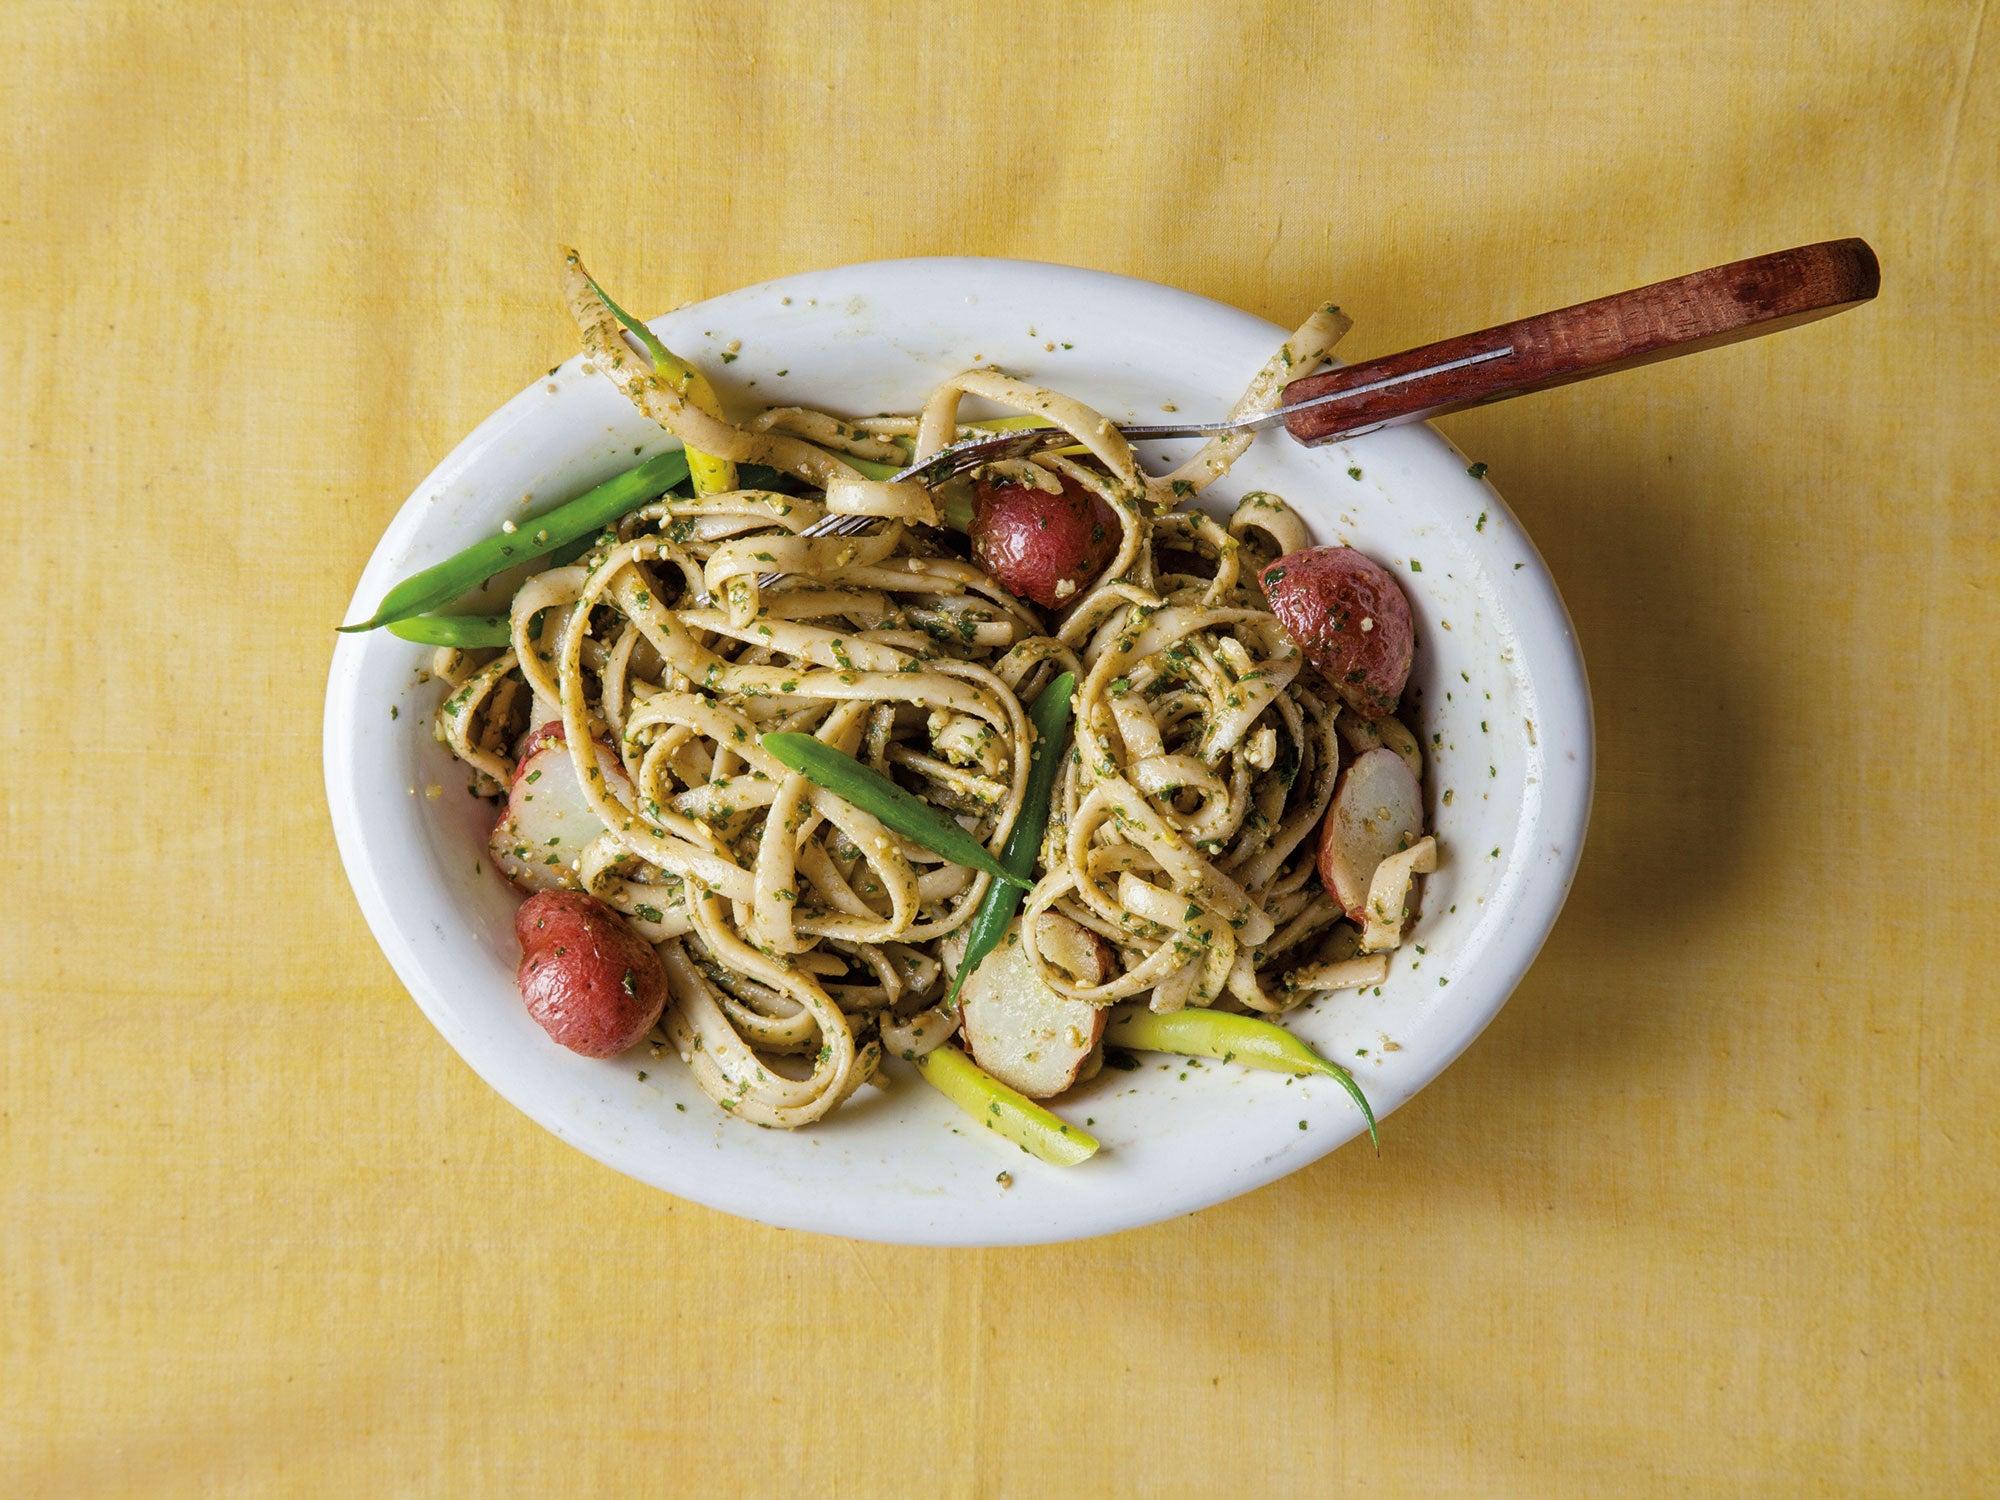 Trenette with Pesto, Beans & Potatoes